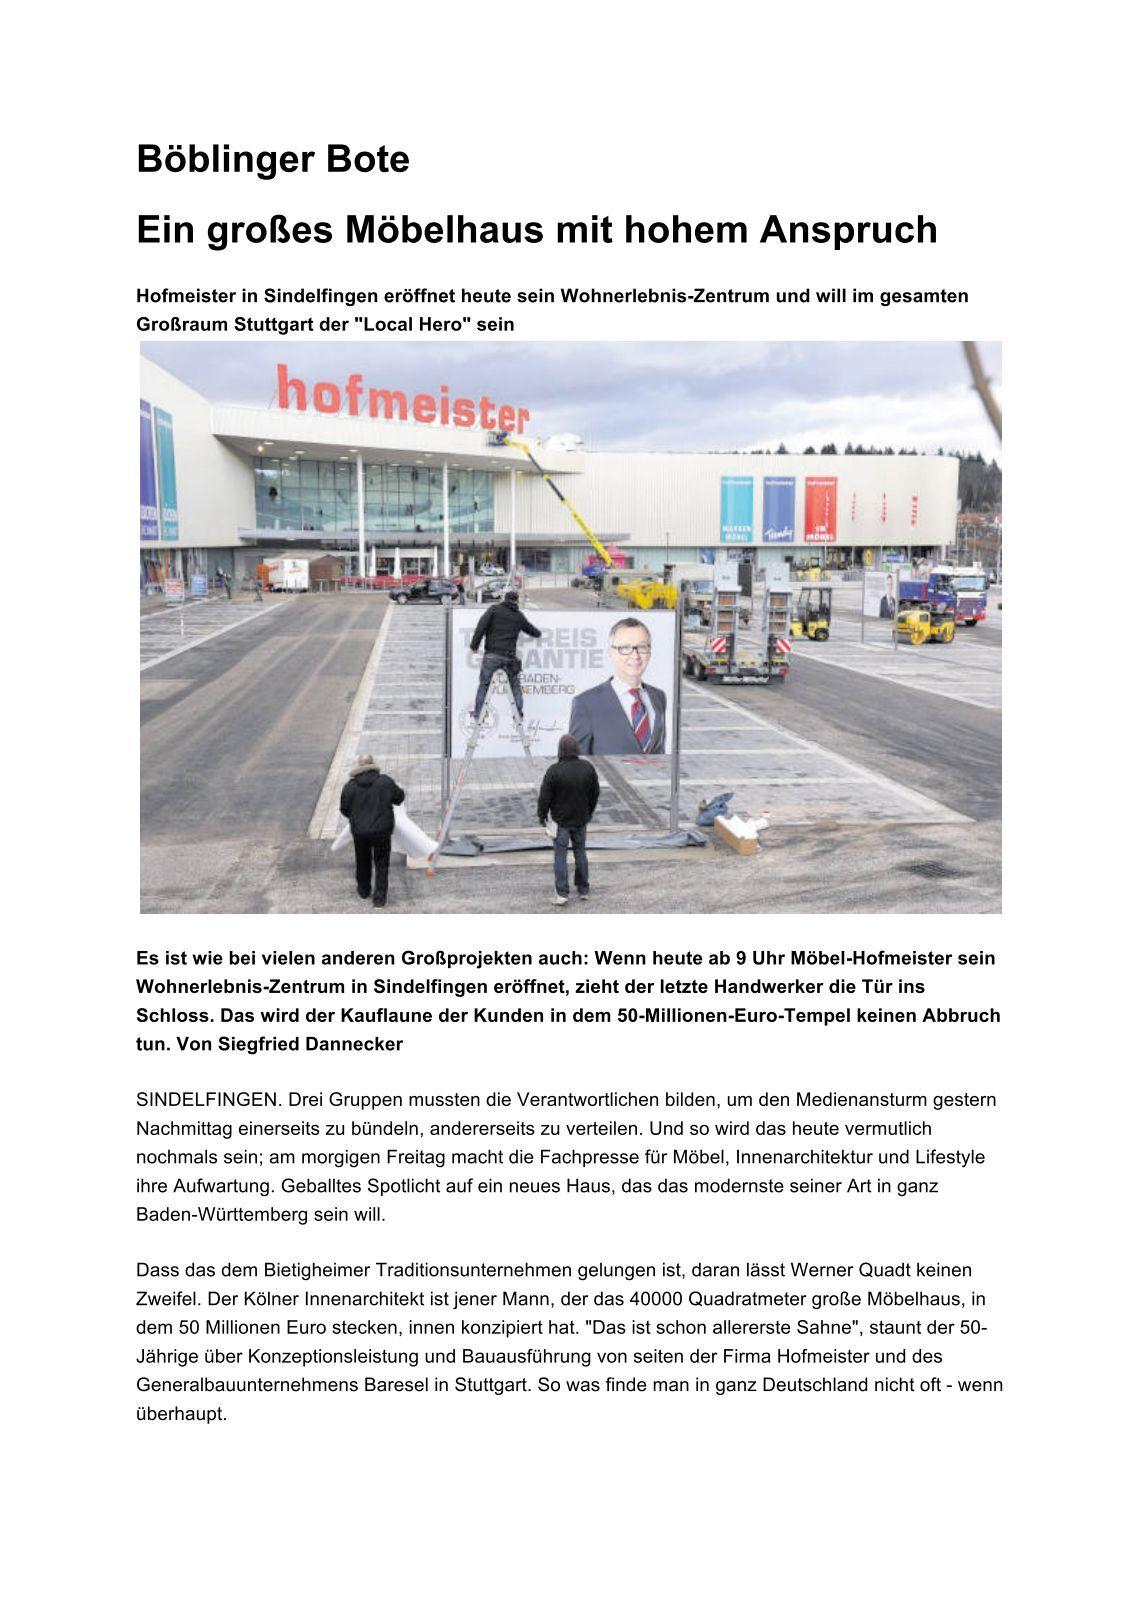 6 free magazines from quadt.koeln.de, Innenarchitektur ideen